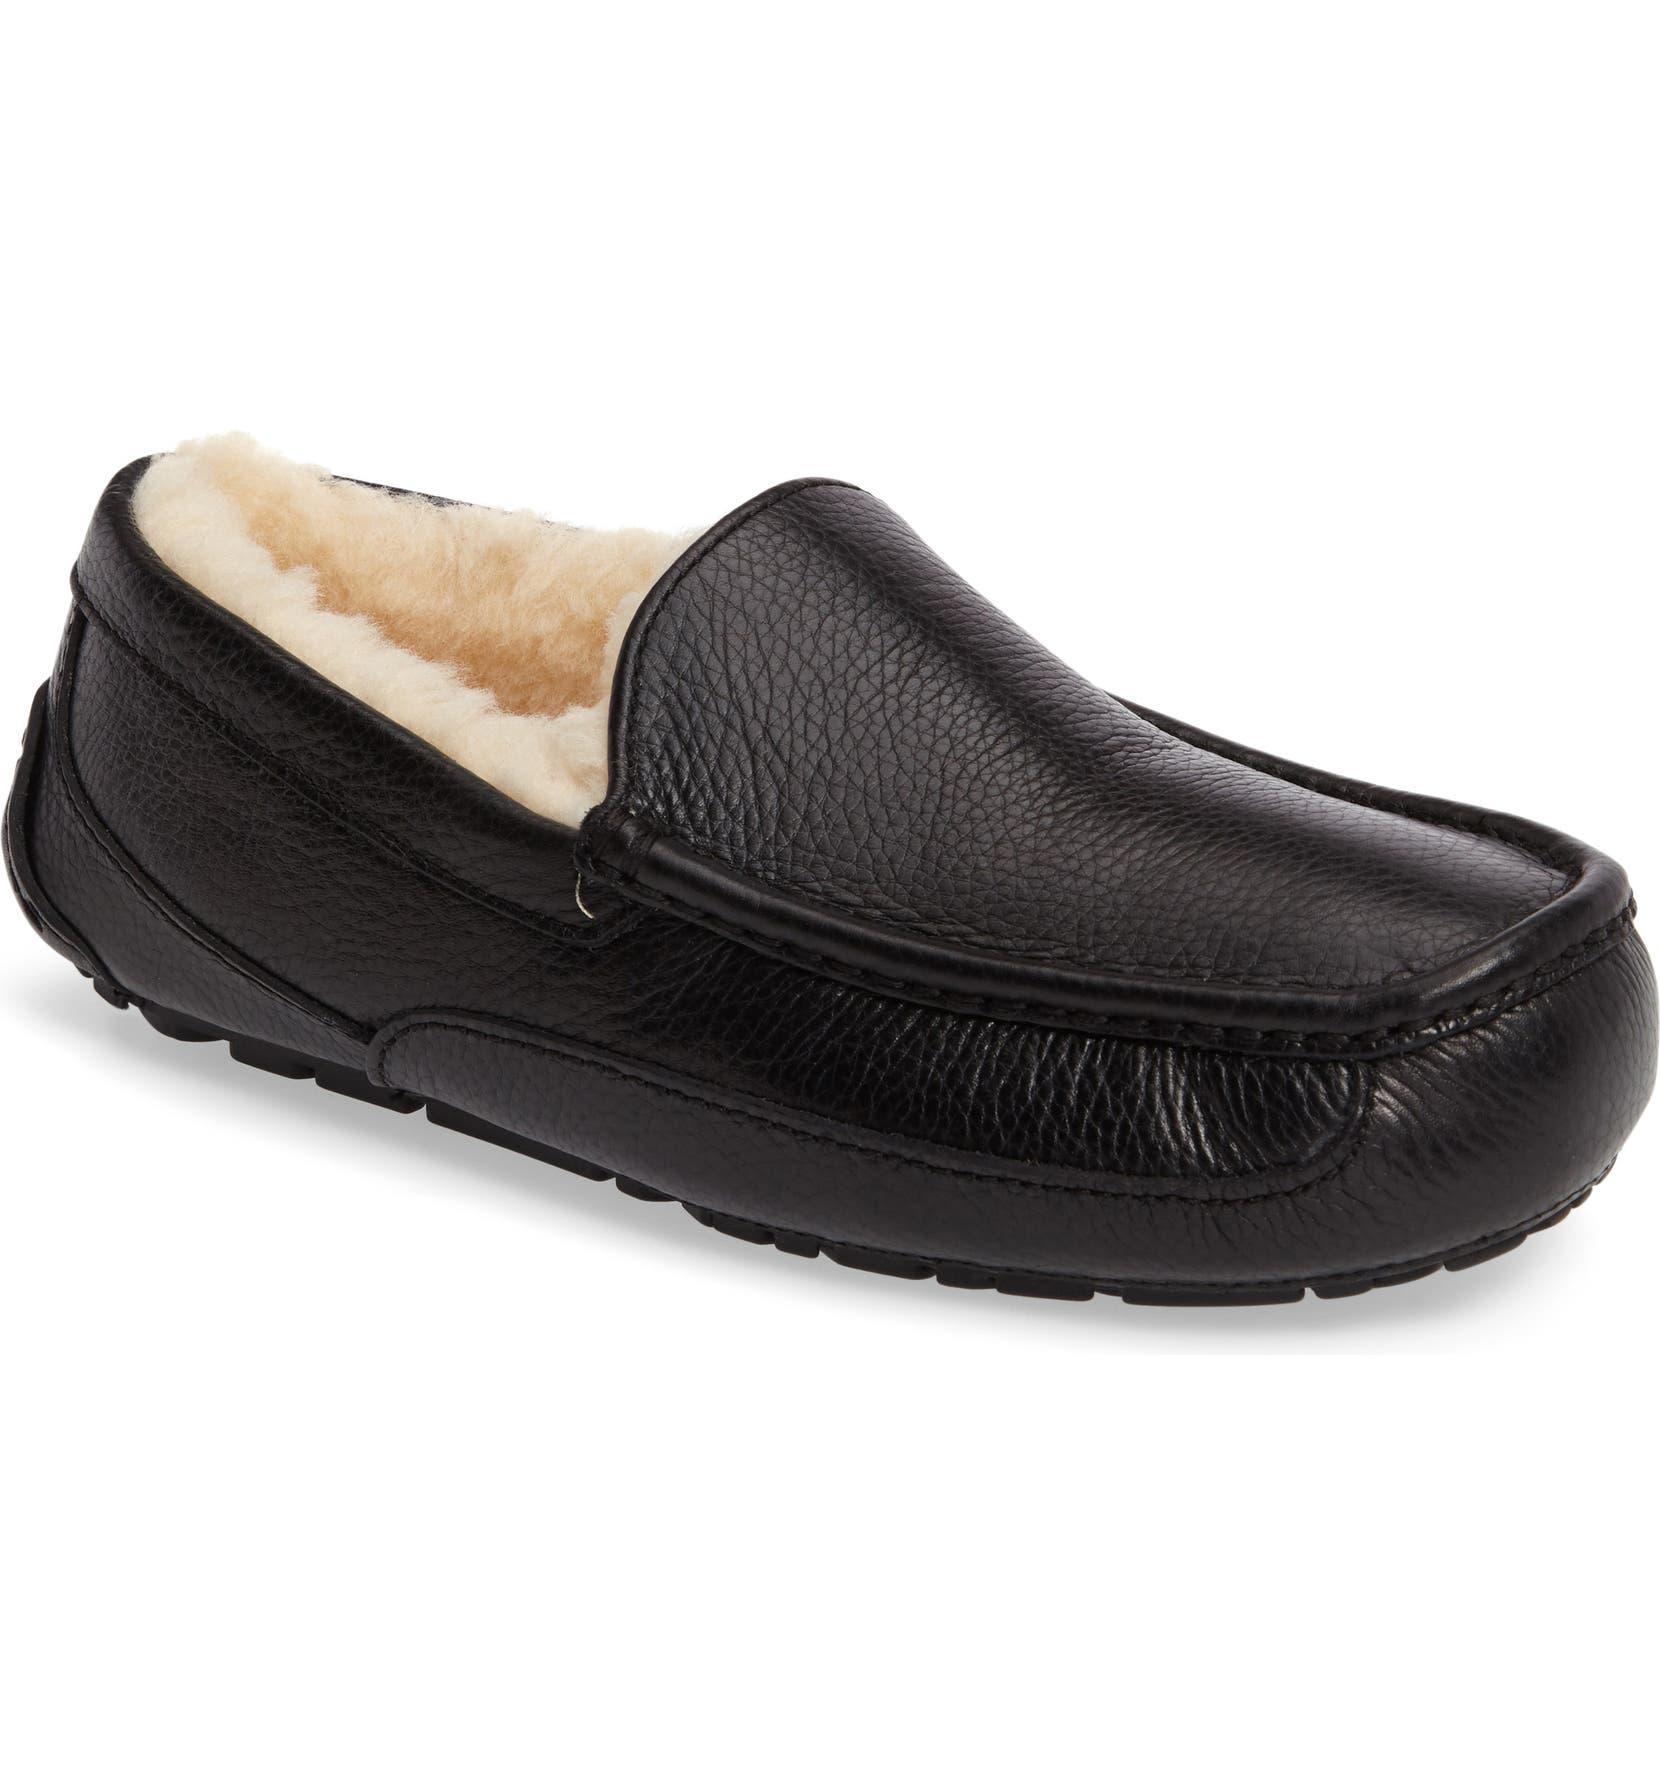 7b745948c85 Ascot Leather Slipper